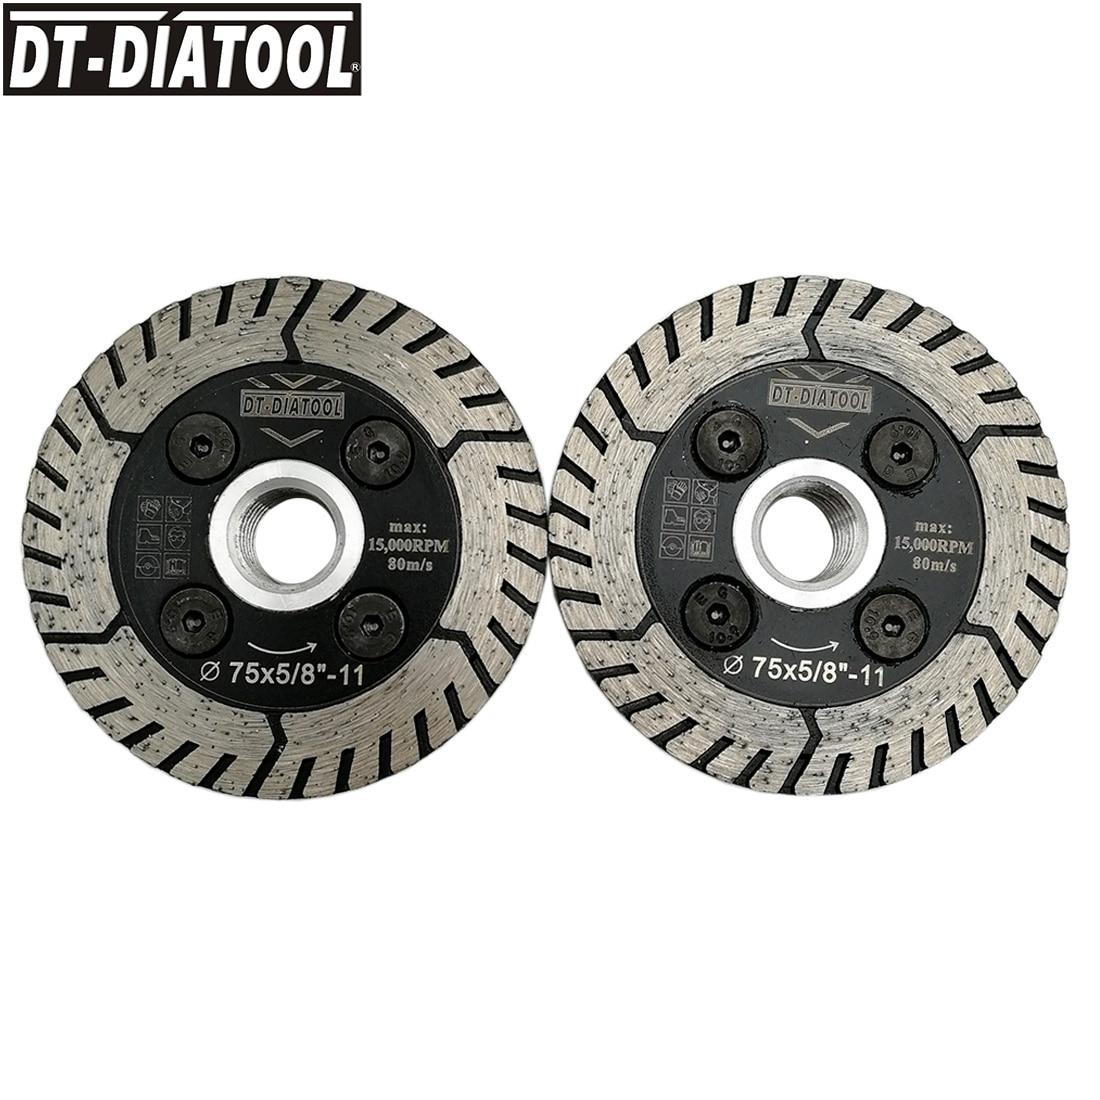 DT-DIATOOL 2pcs/set Diamond Dual Wheel Cutting & Grinding Saw Blade Cutting Disc For Granite Marble 5/8-11 Thread Dia 3inch/75mm